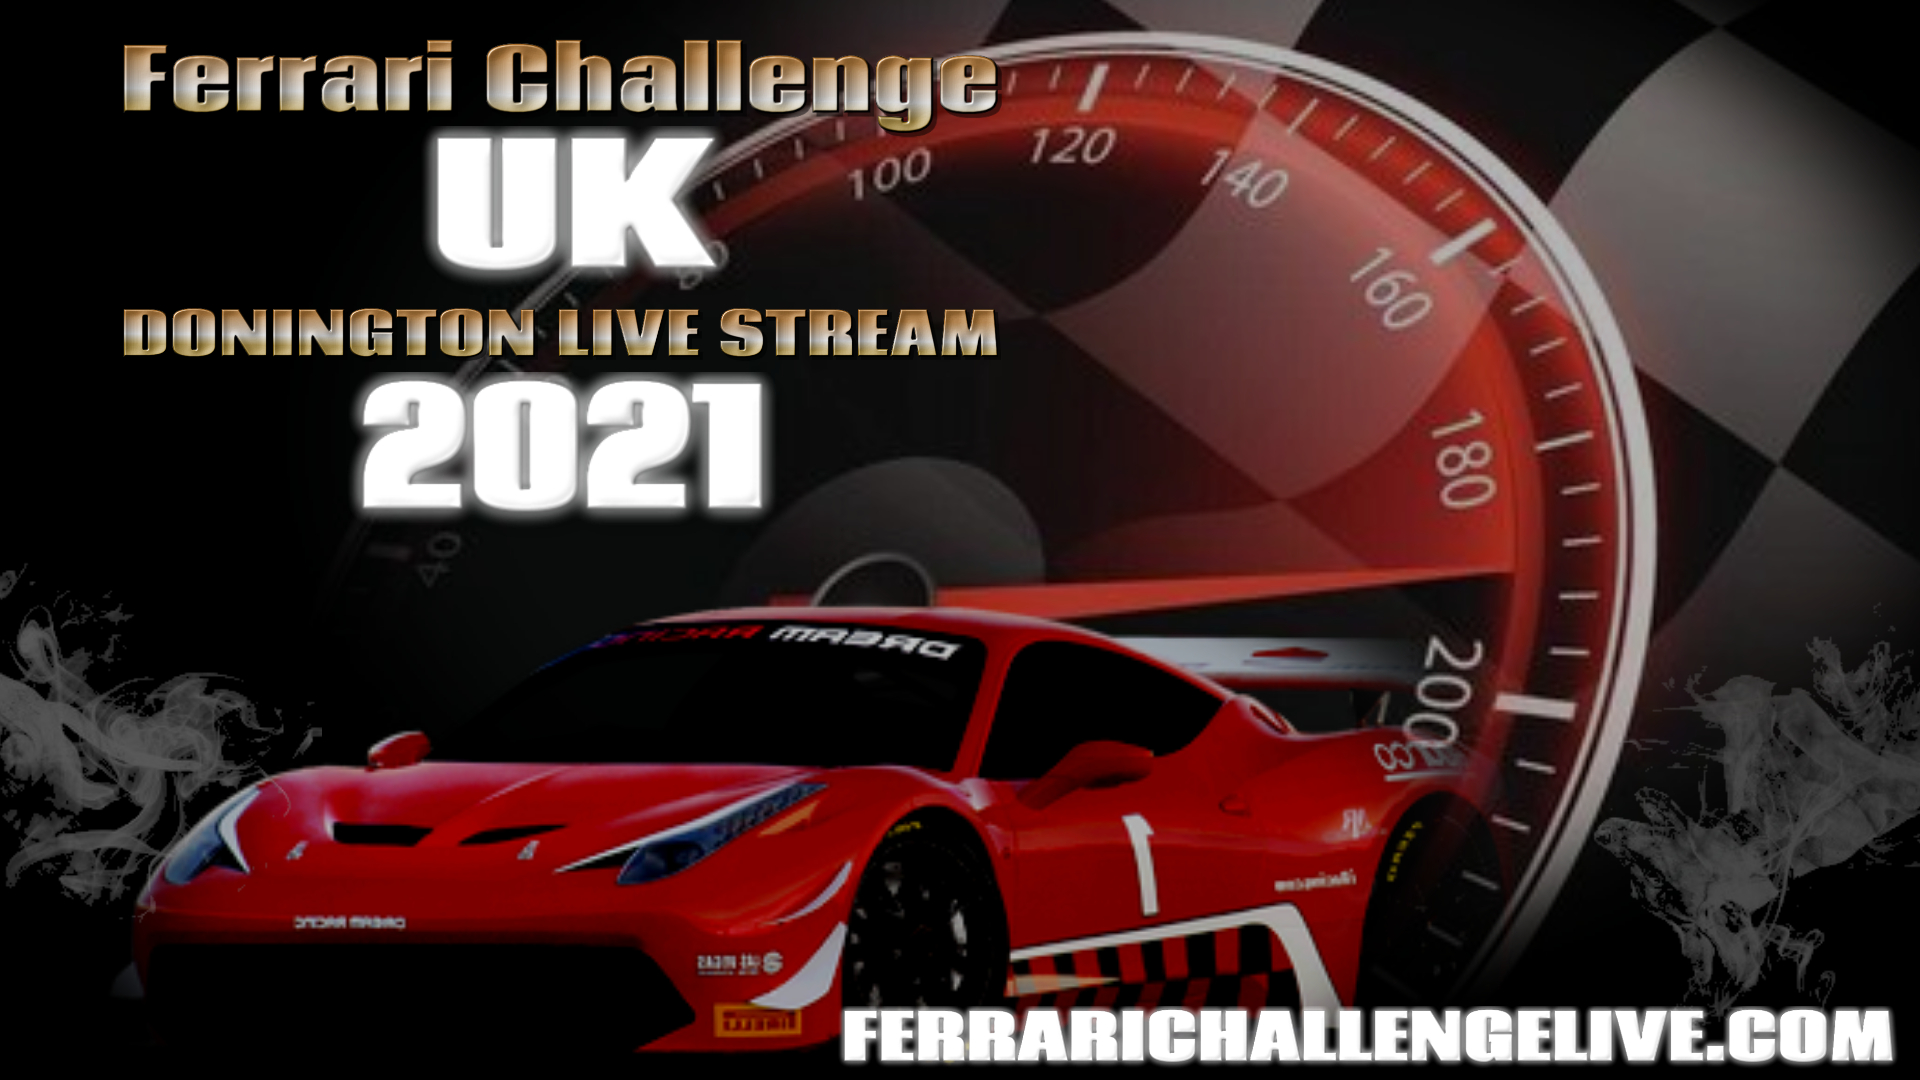 Donington Live Stream 2021   Ferrari Challenge UK